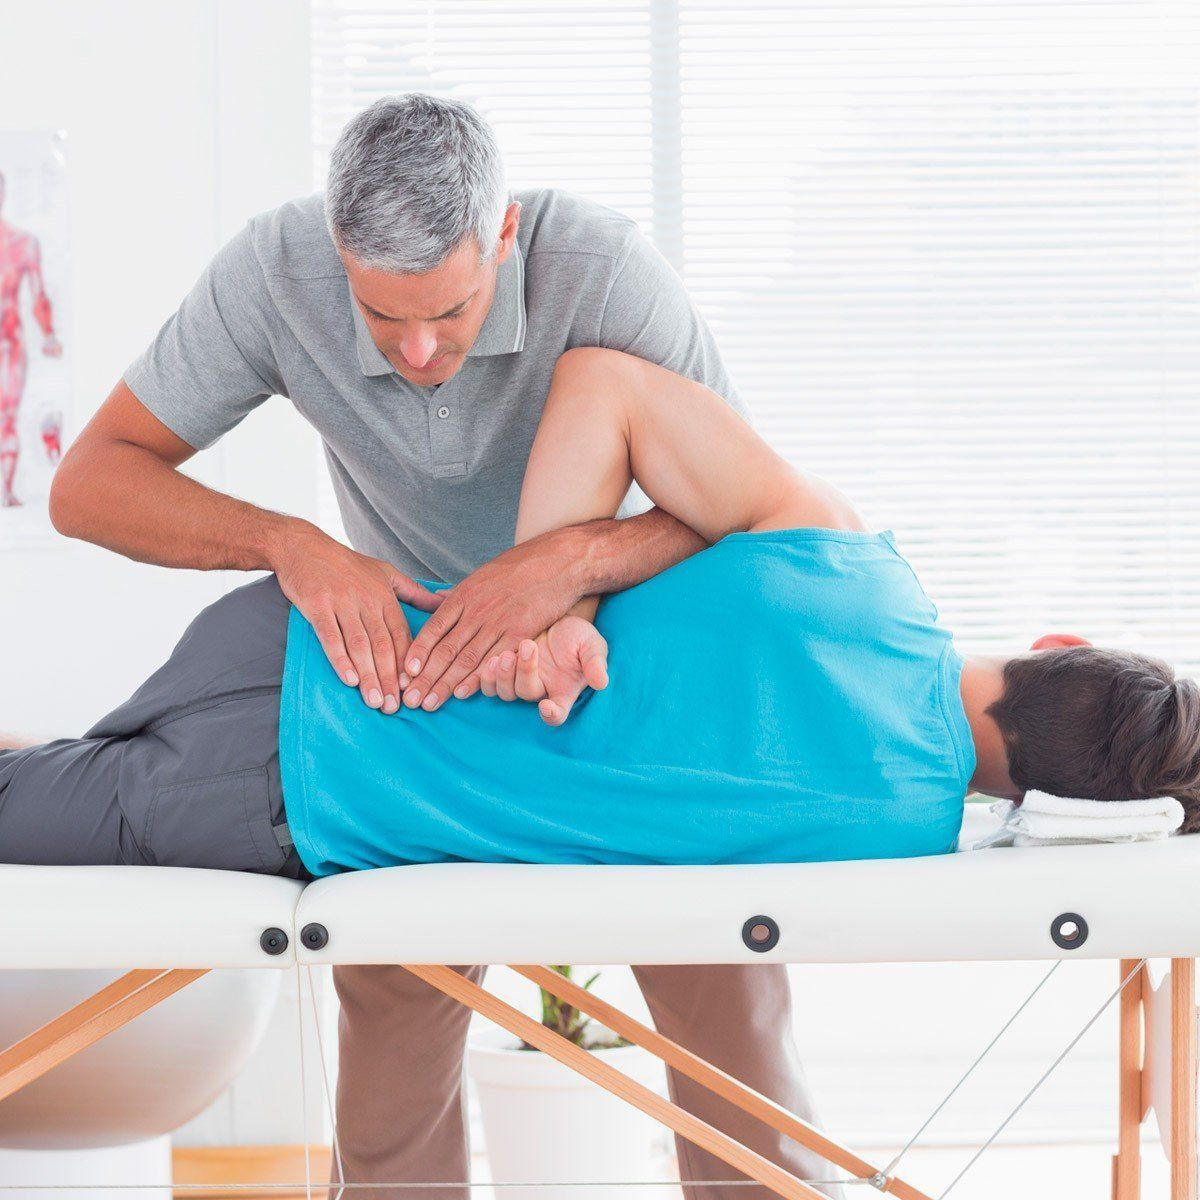 Cuidados Paliativos e Terapia de Dor  - PUC Minas